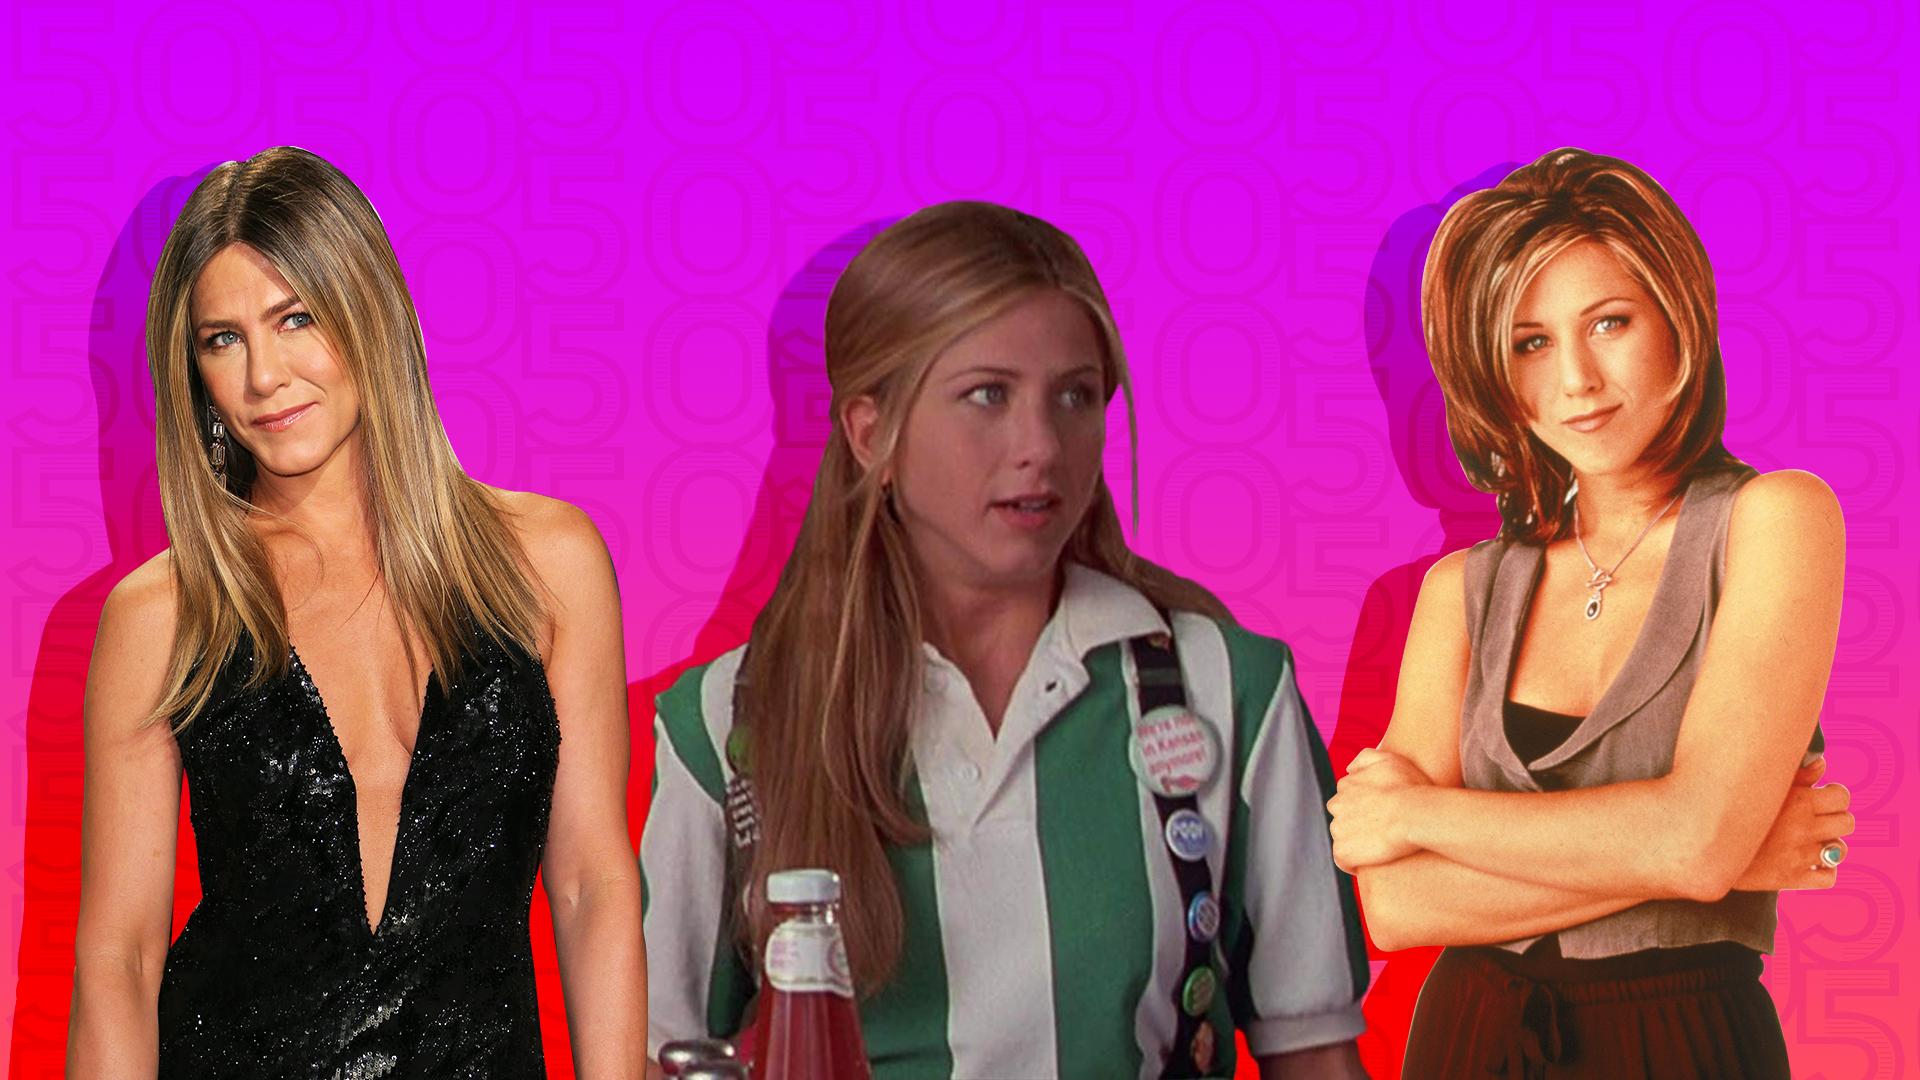 1ca2ba3bdae9 50 Reasons We Love Jennifer Aniston on Her 50th Birthday – SheKnows